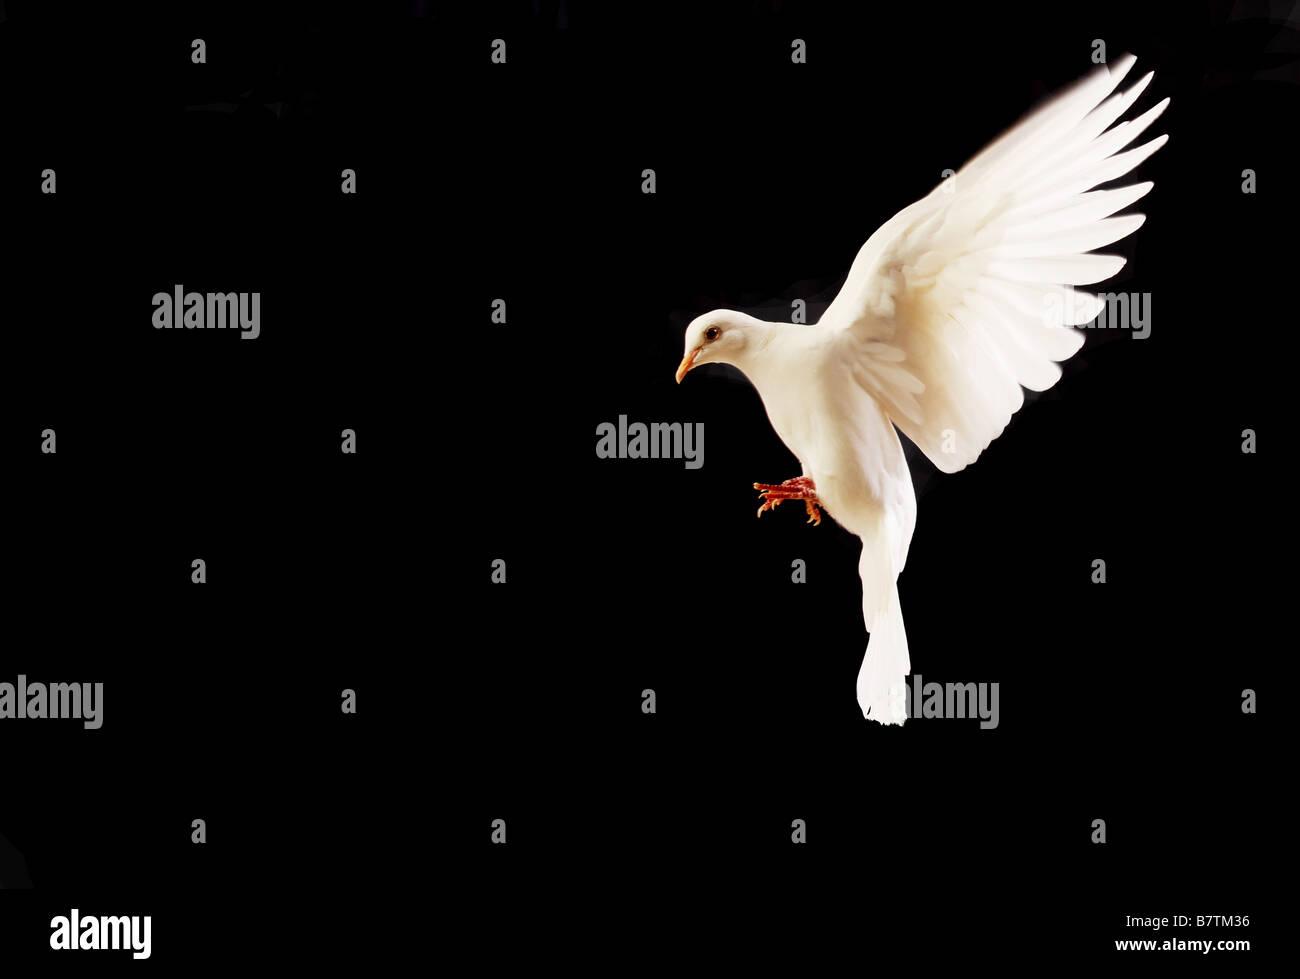 Flying white dove isolated on black Photo Stock